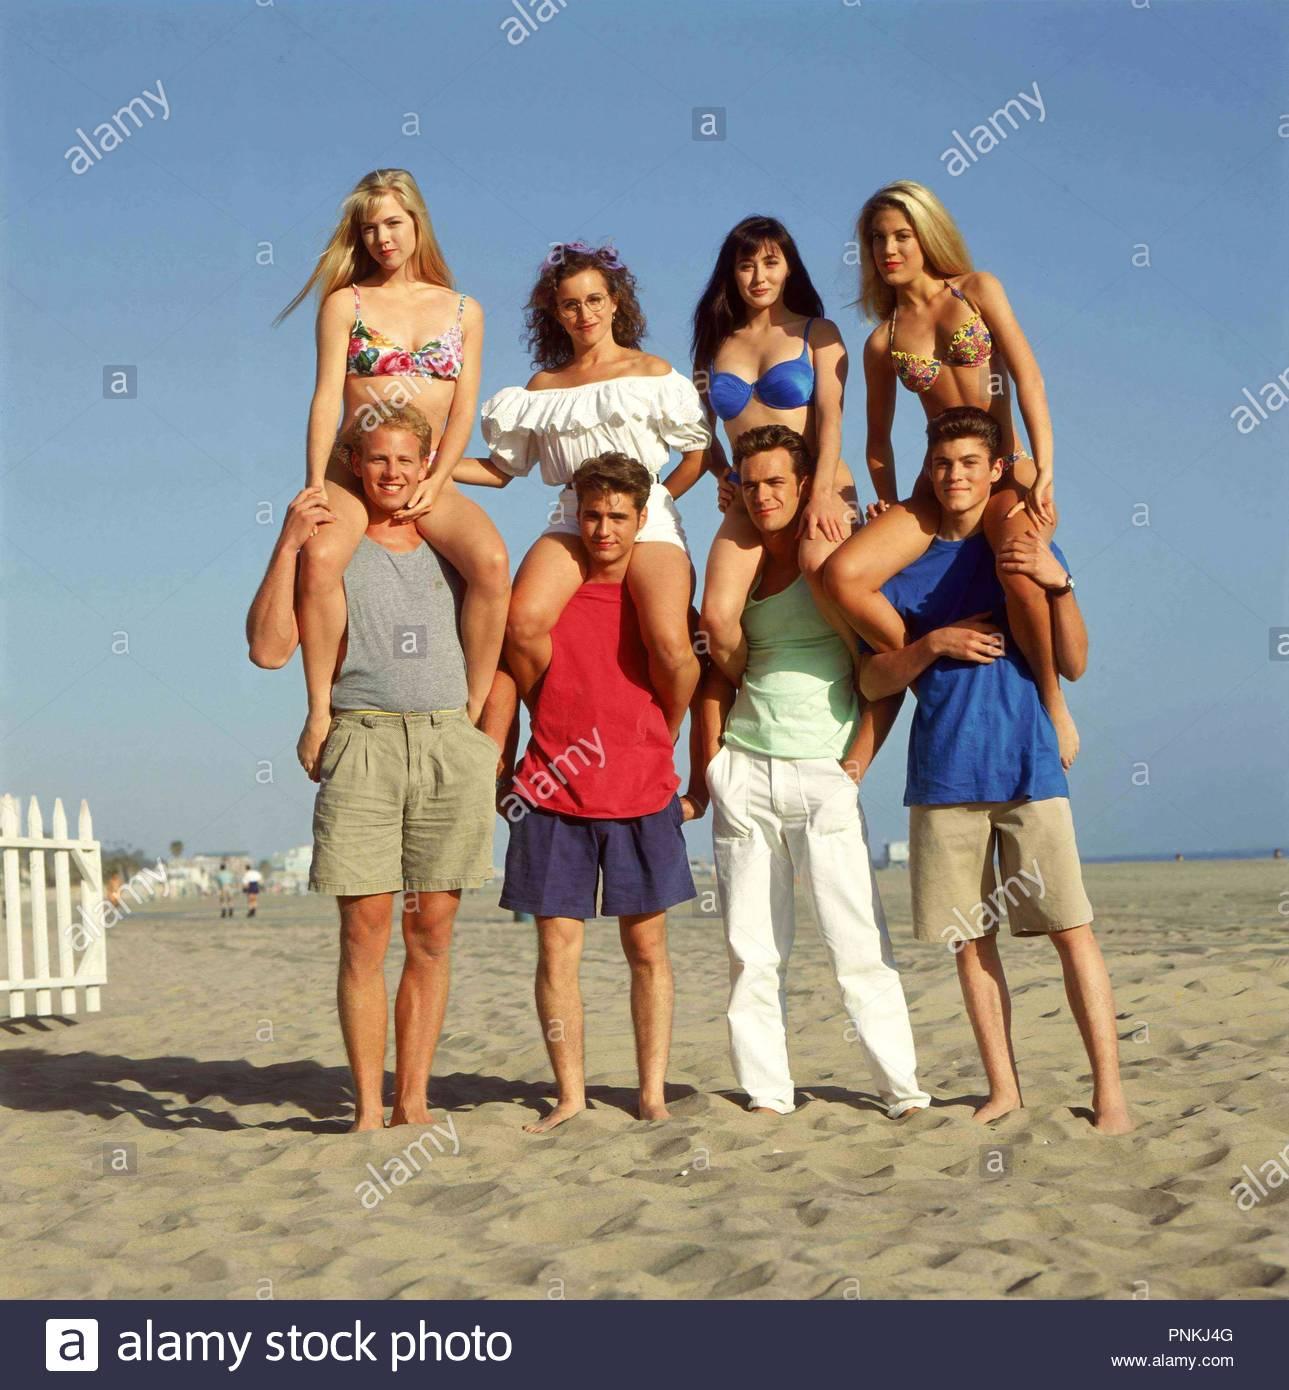 Original film title: BEVERLY HILLS, 90210. English title: BEVERLY HILLS, 90210. Year: 1990. Stars: LUKE PERRY; TORI SPELLING; JASON PRIESTLEY; IAN ZIERING; JENNIE GARTH; BRIAN AUSTIN GREEN. Credit: FOX/BROADCASTING CO. / Album - Stock Image